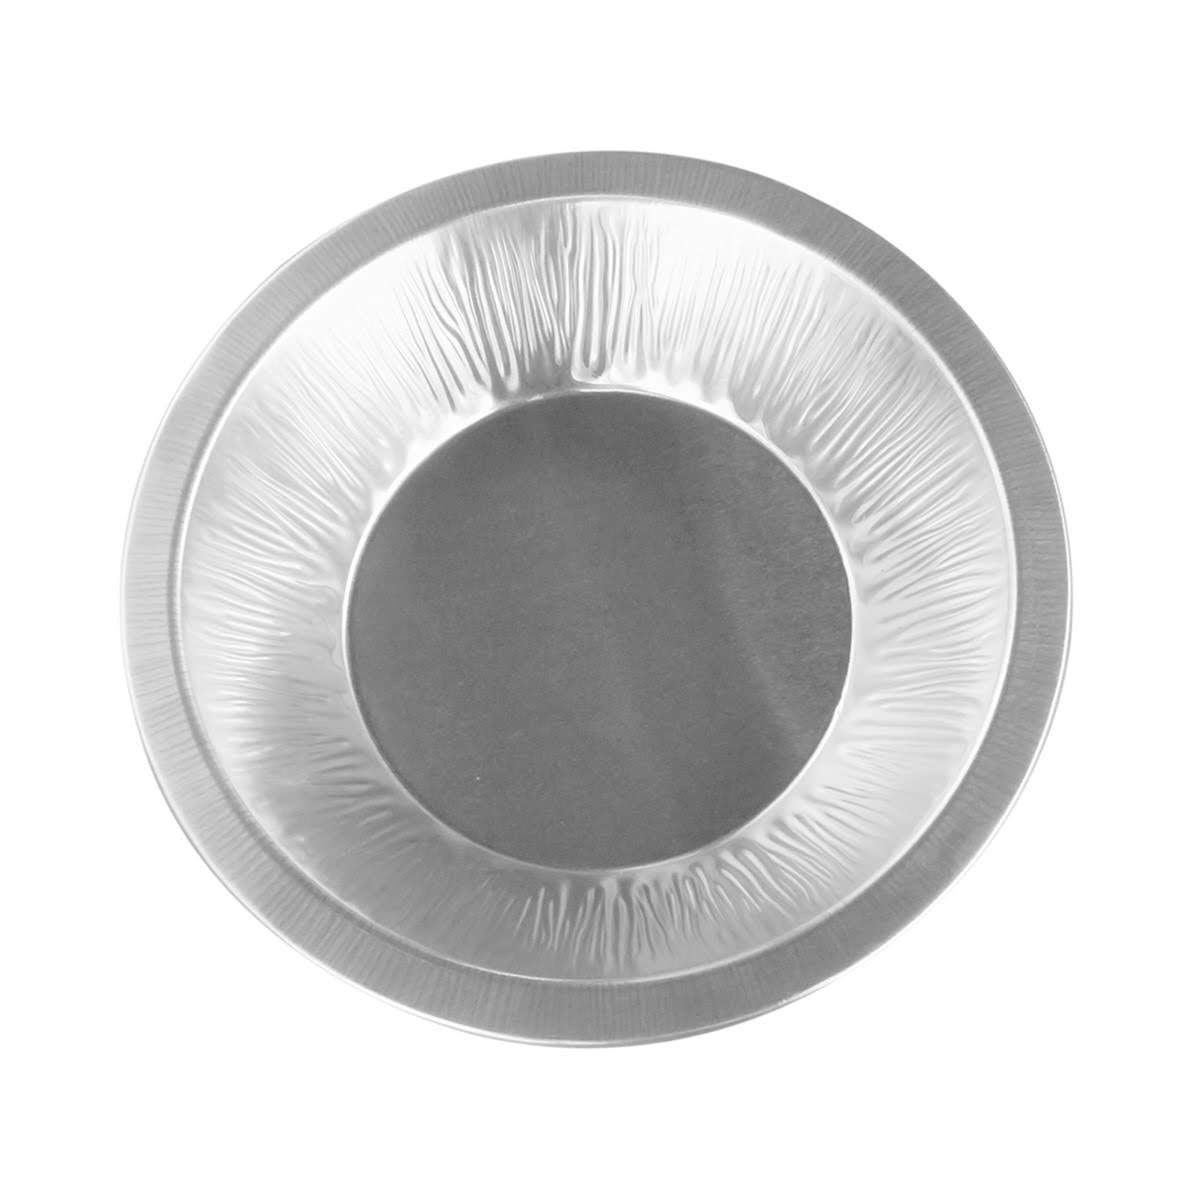 Disposable/Reusable Heavy Duty Aluminum 6